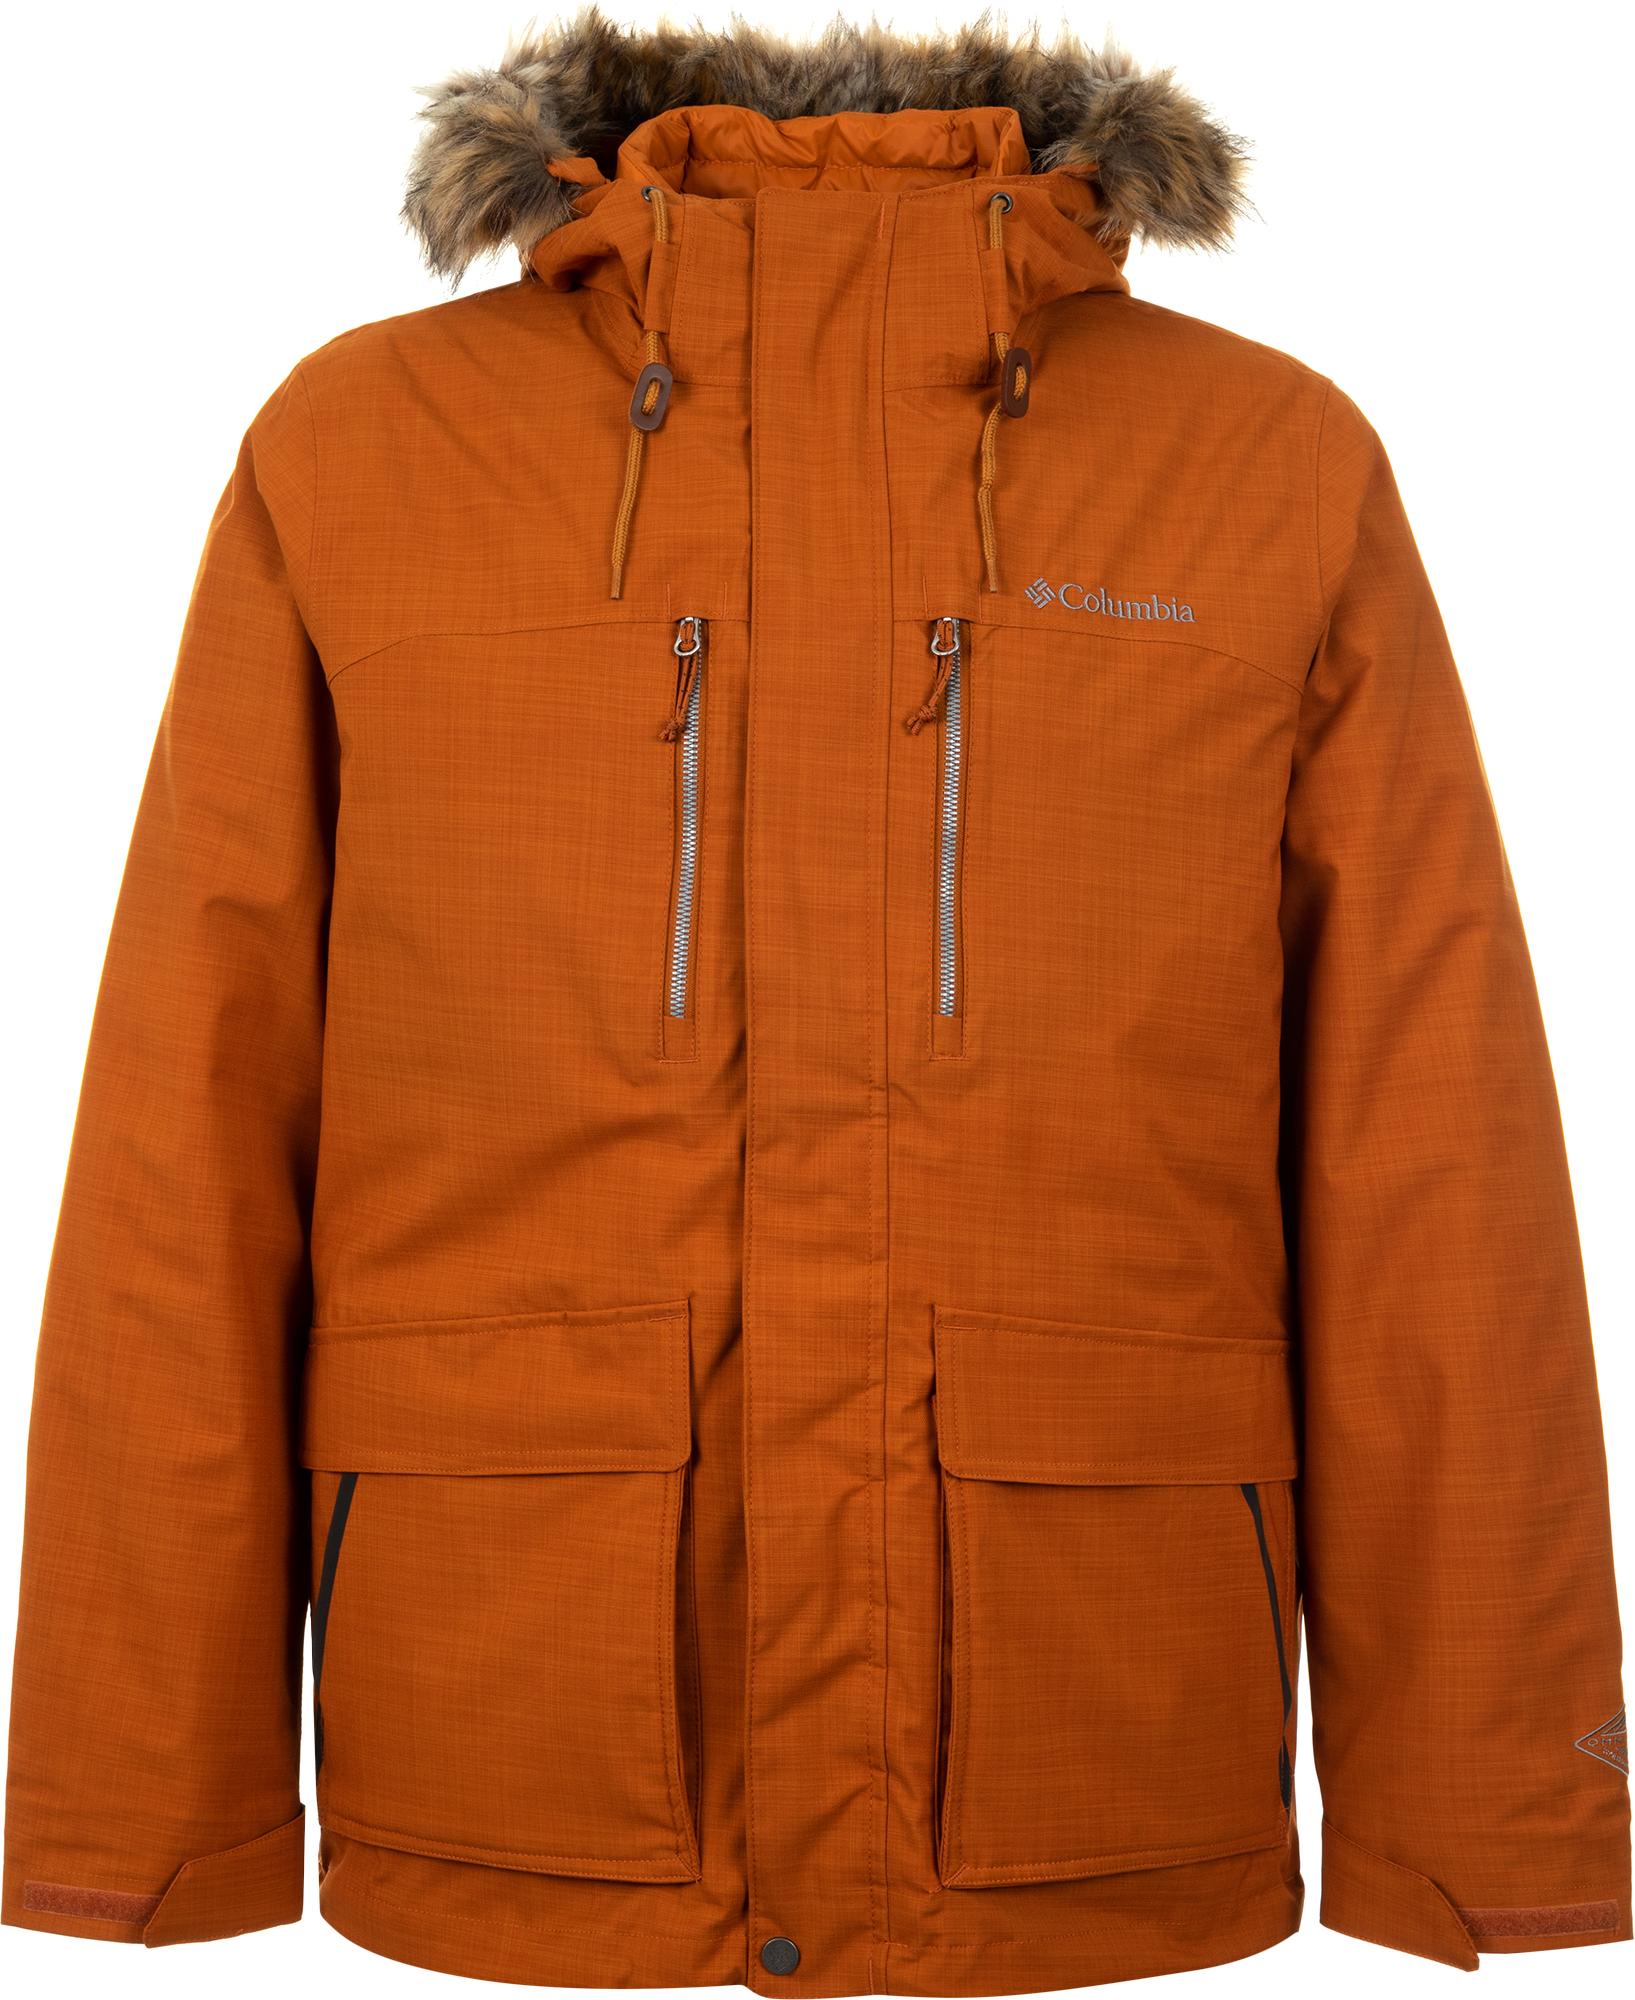 Columbia Куртка 3 в 1 мужская Columbia Bean Bluff, размер 52-54 columbia куртка 3 в 1 мужская columbia whirlibird размер 48 50